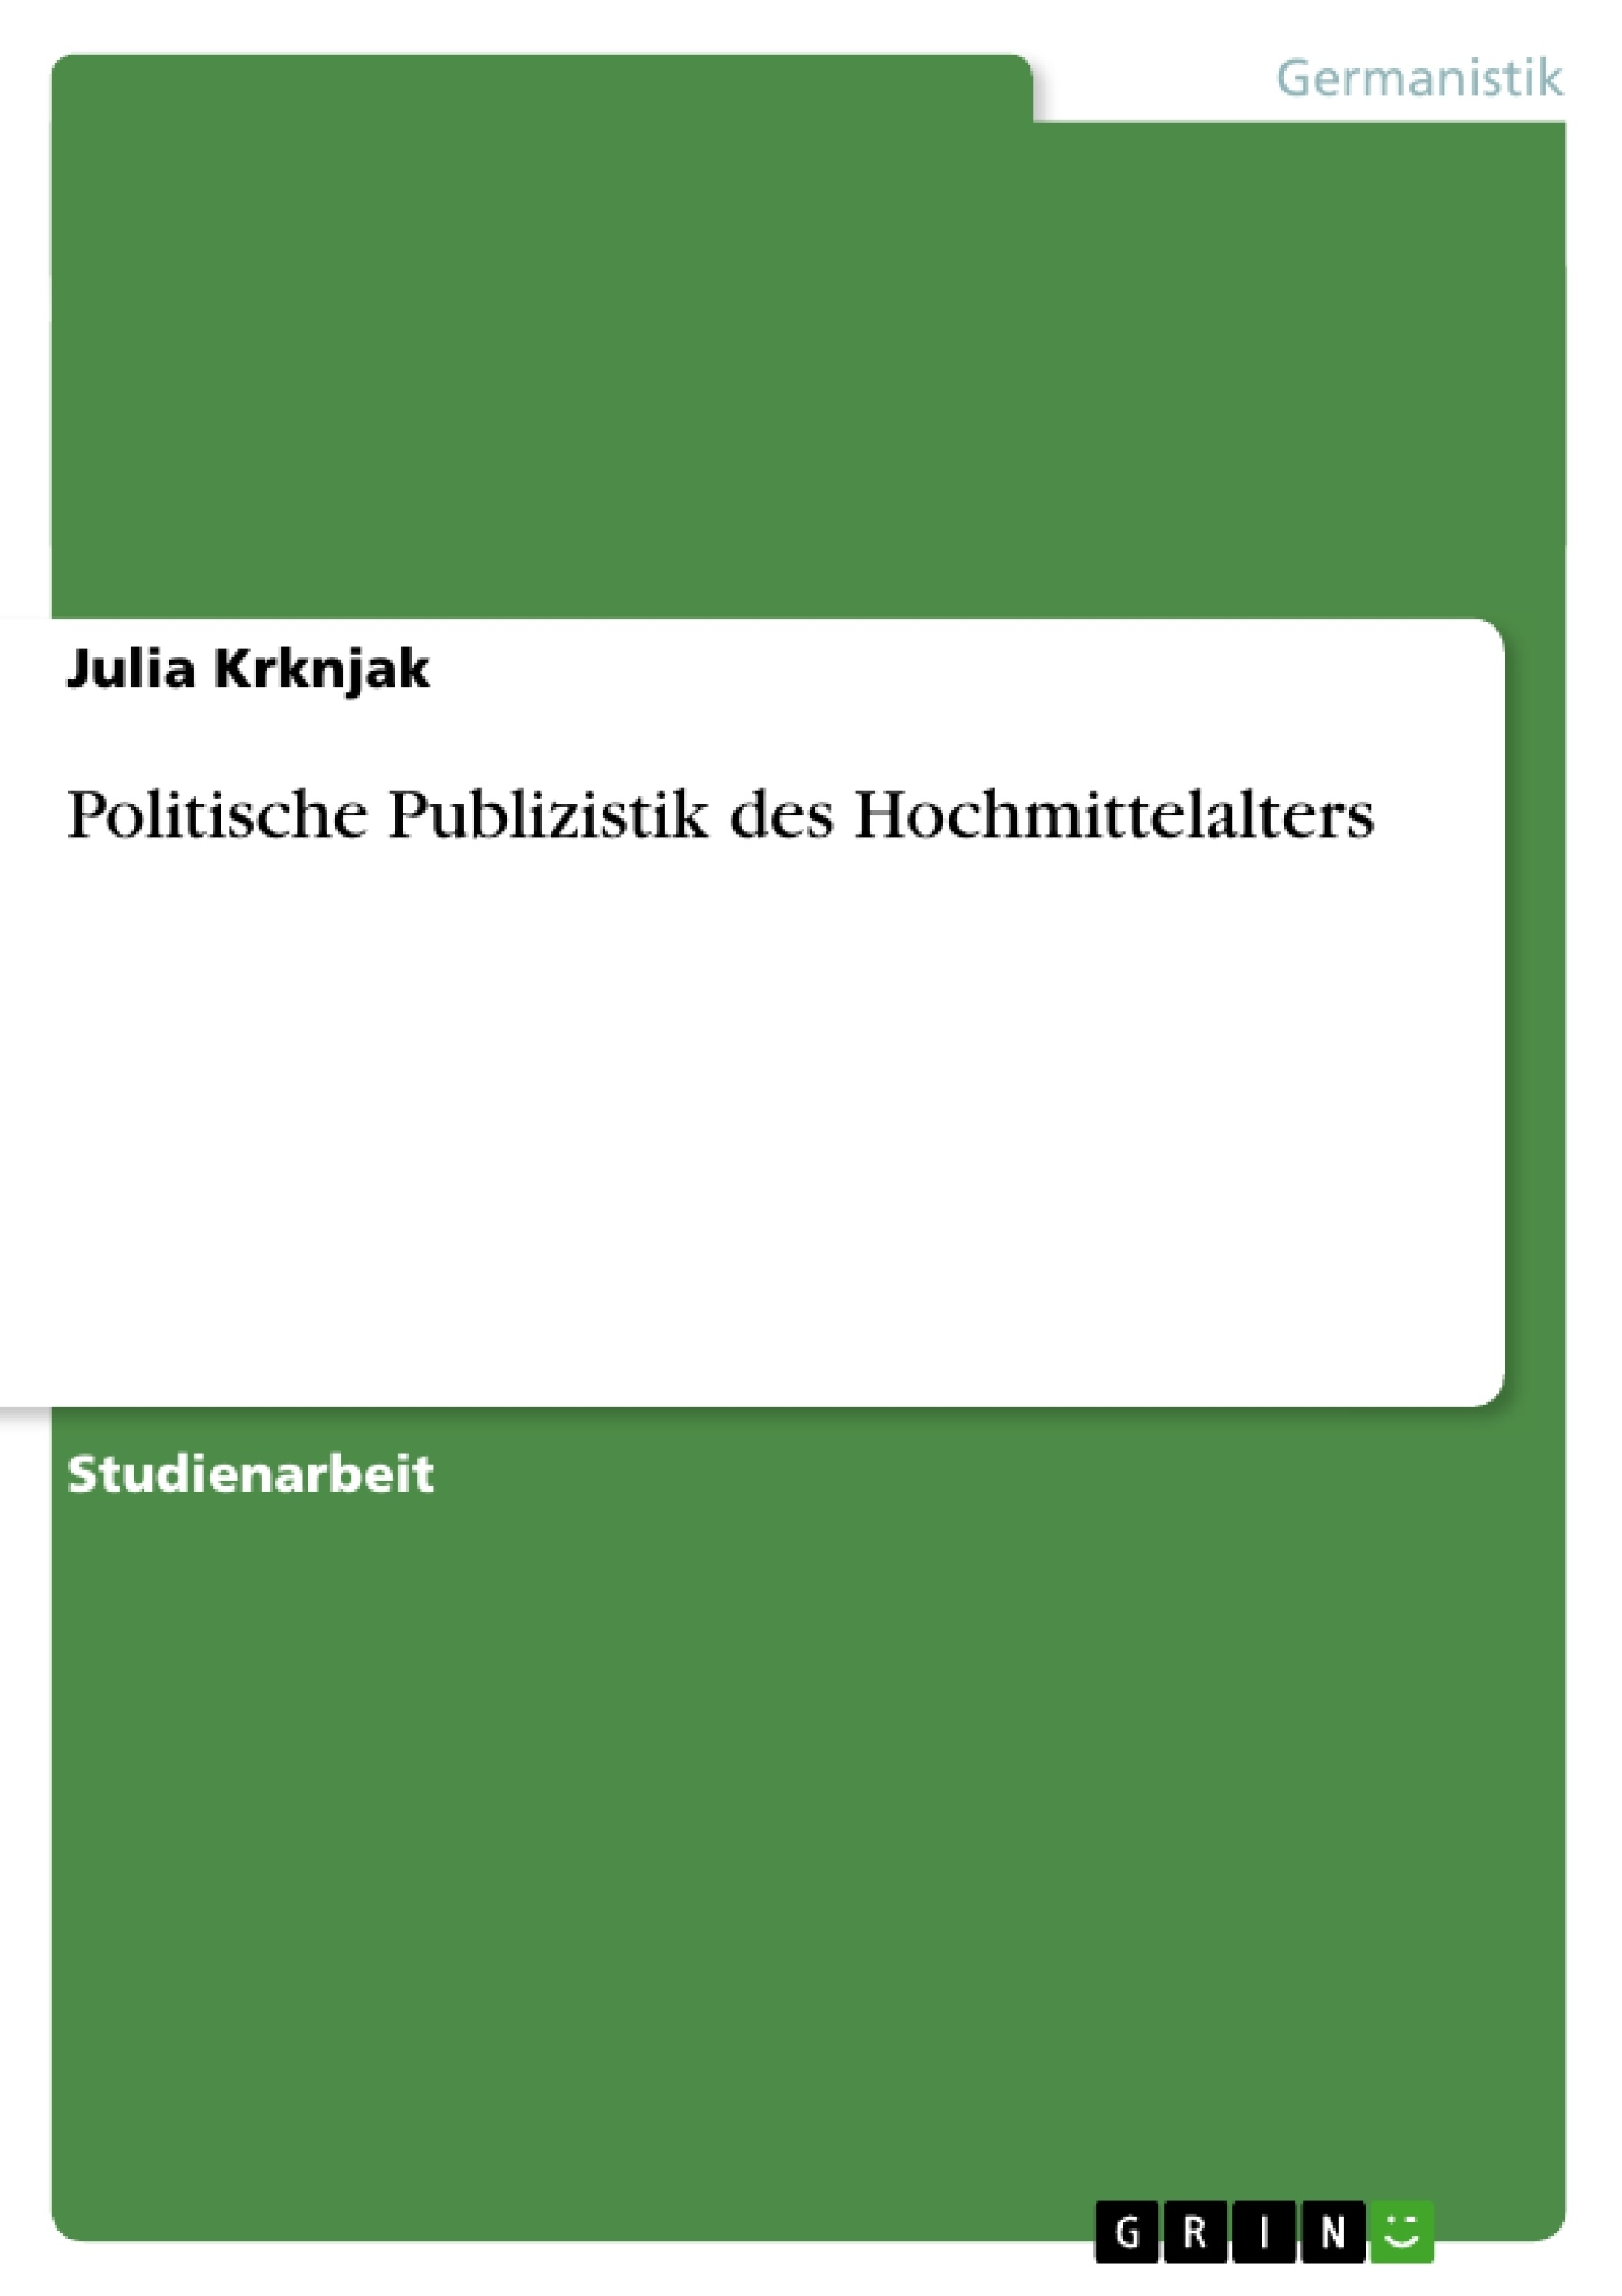 Titel: Politische Publizistik des Hochmittelalters